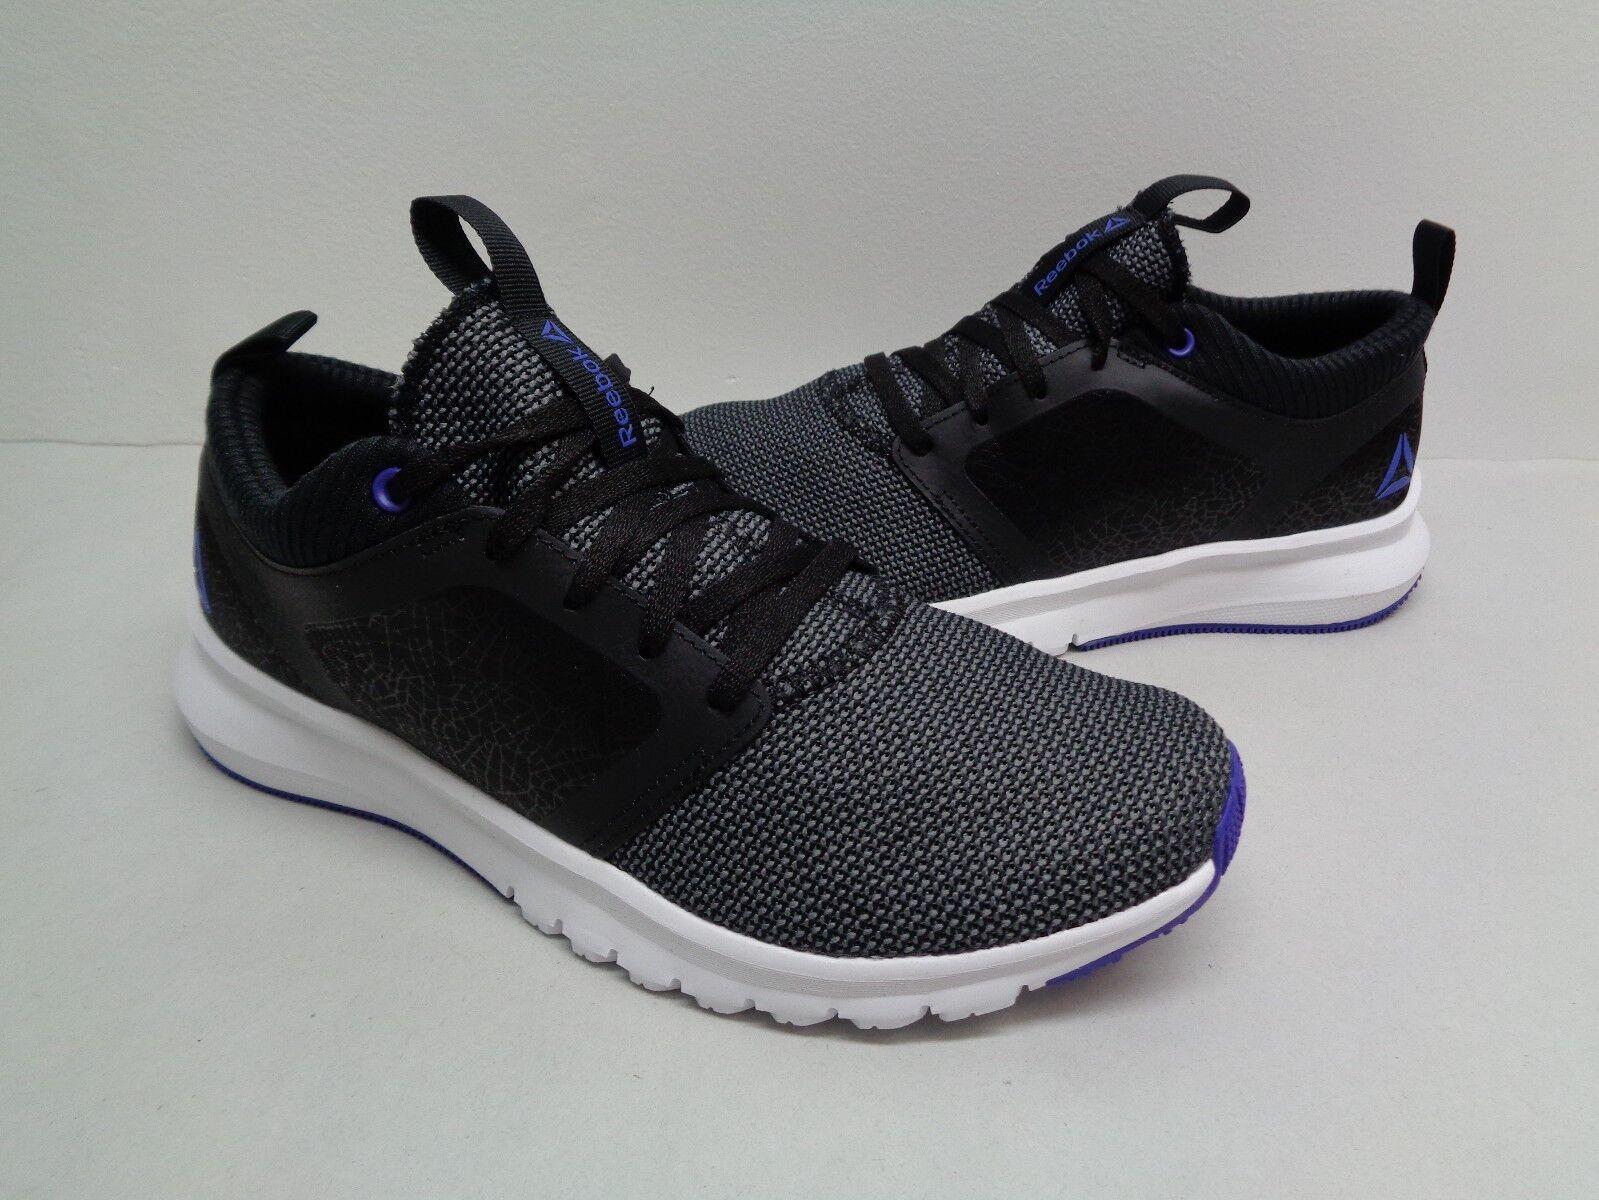 Reebok Size 7 PRINT ATHLUX SHATR Black Purple Purple Purple Running Sneakers New Womens shoes 561c89